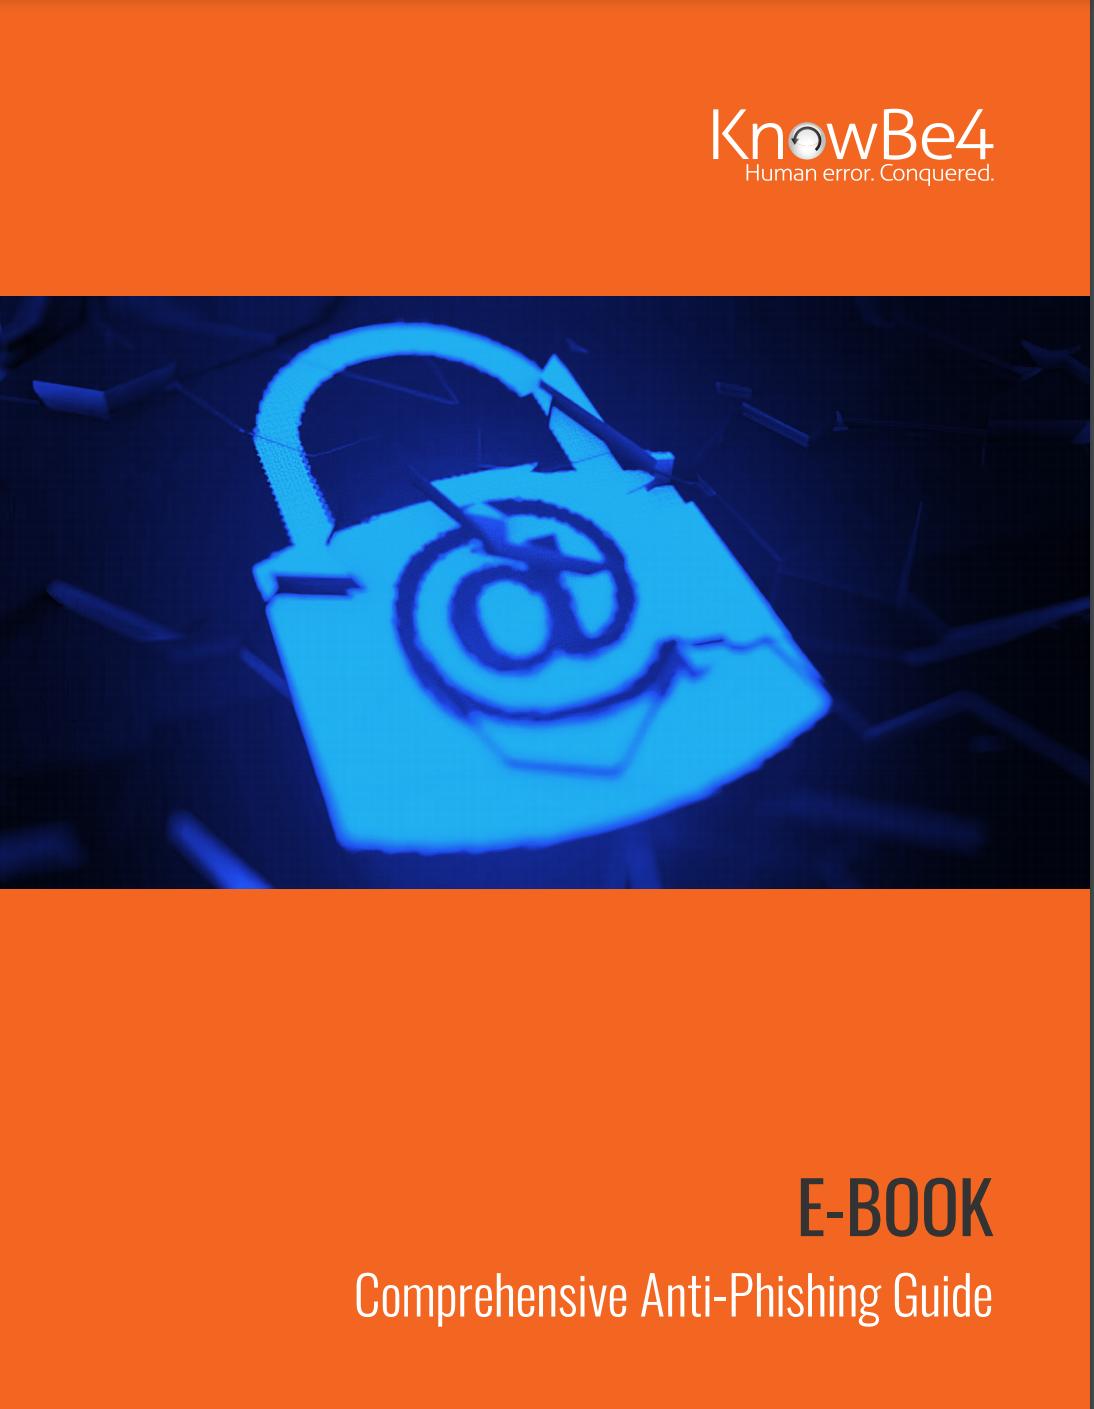 Comprehensive Anti-Phishing Guide